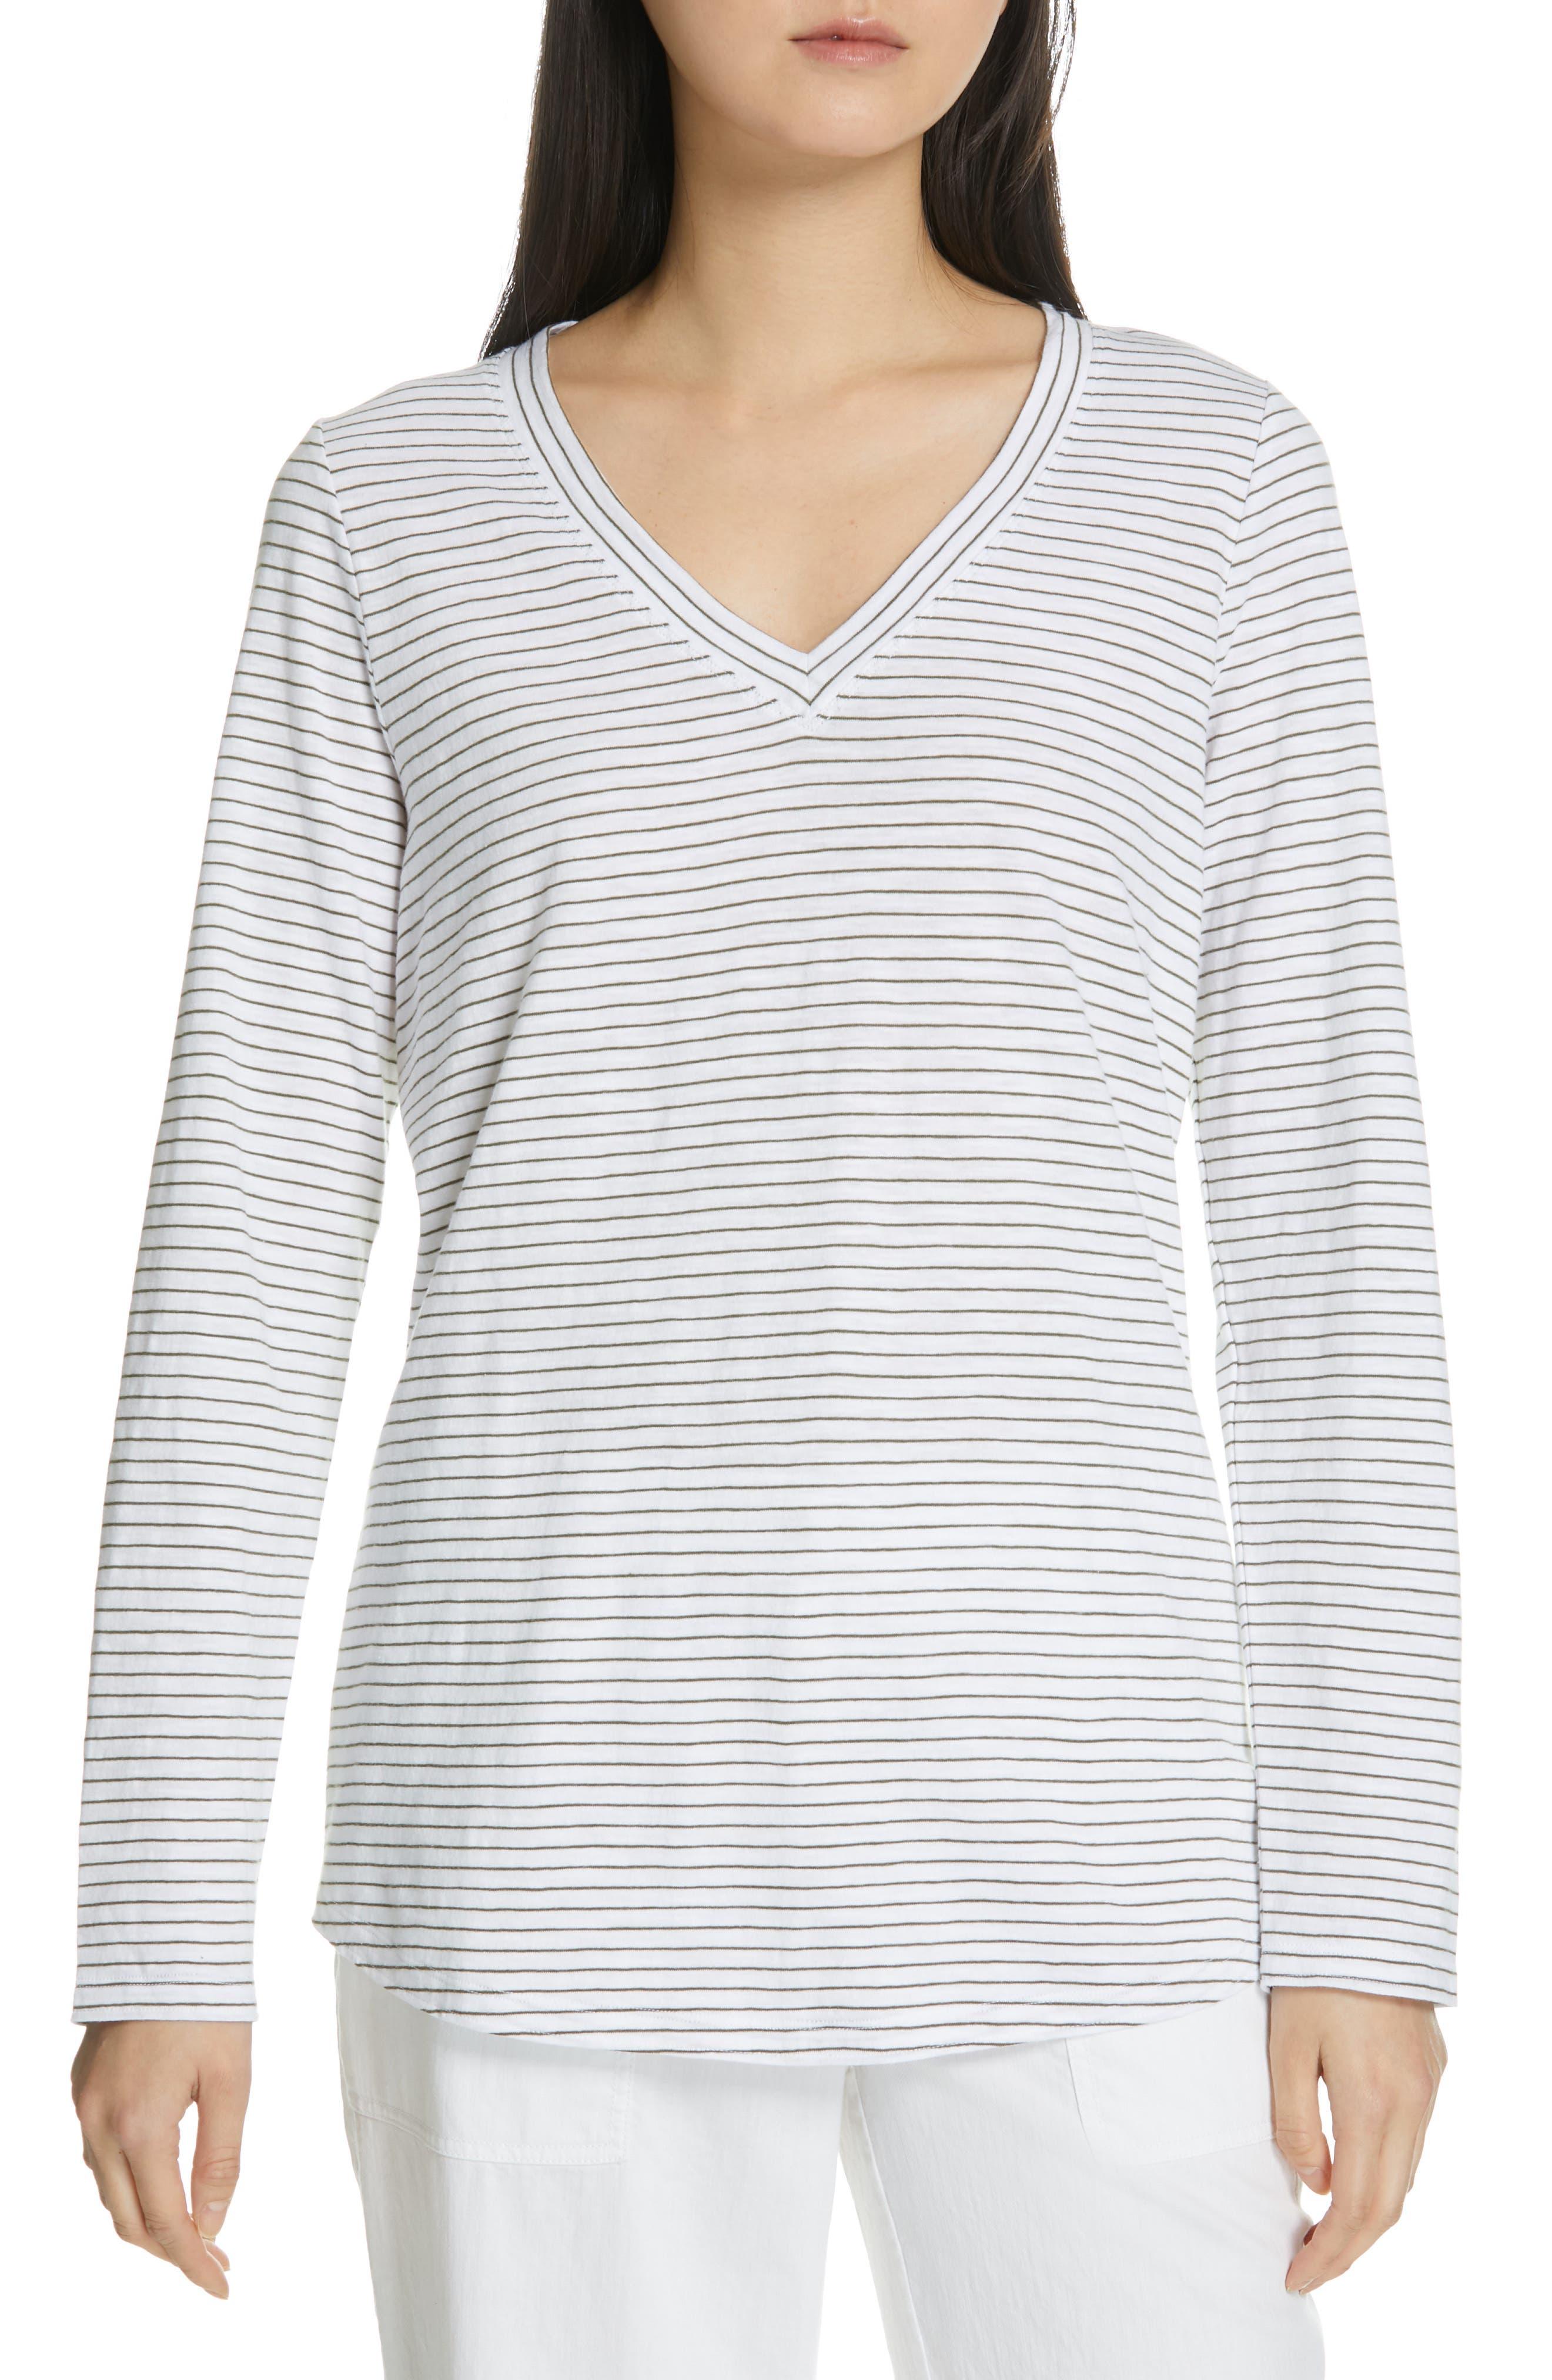 Eileen Fisher Organic Cotton Top, White